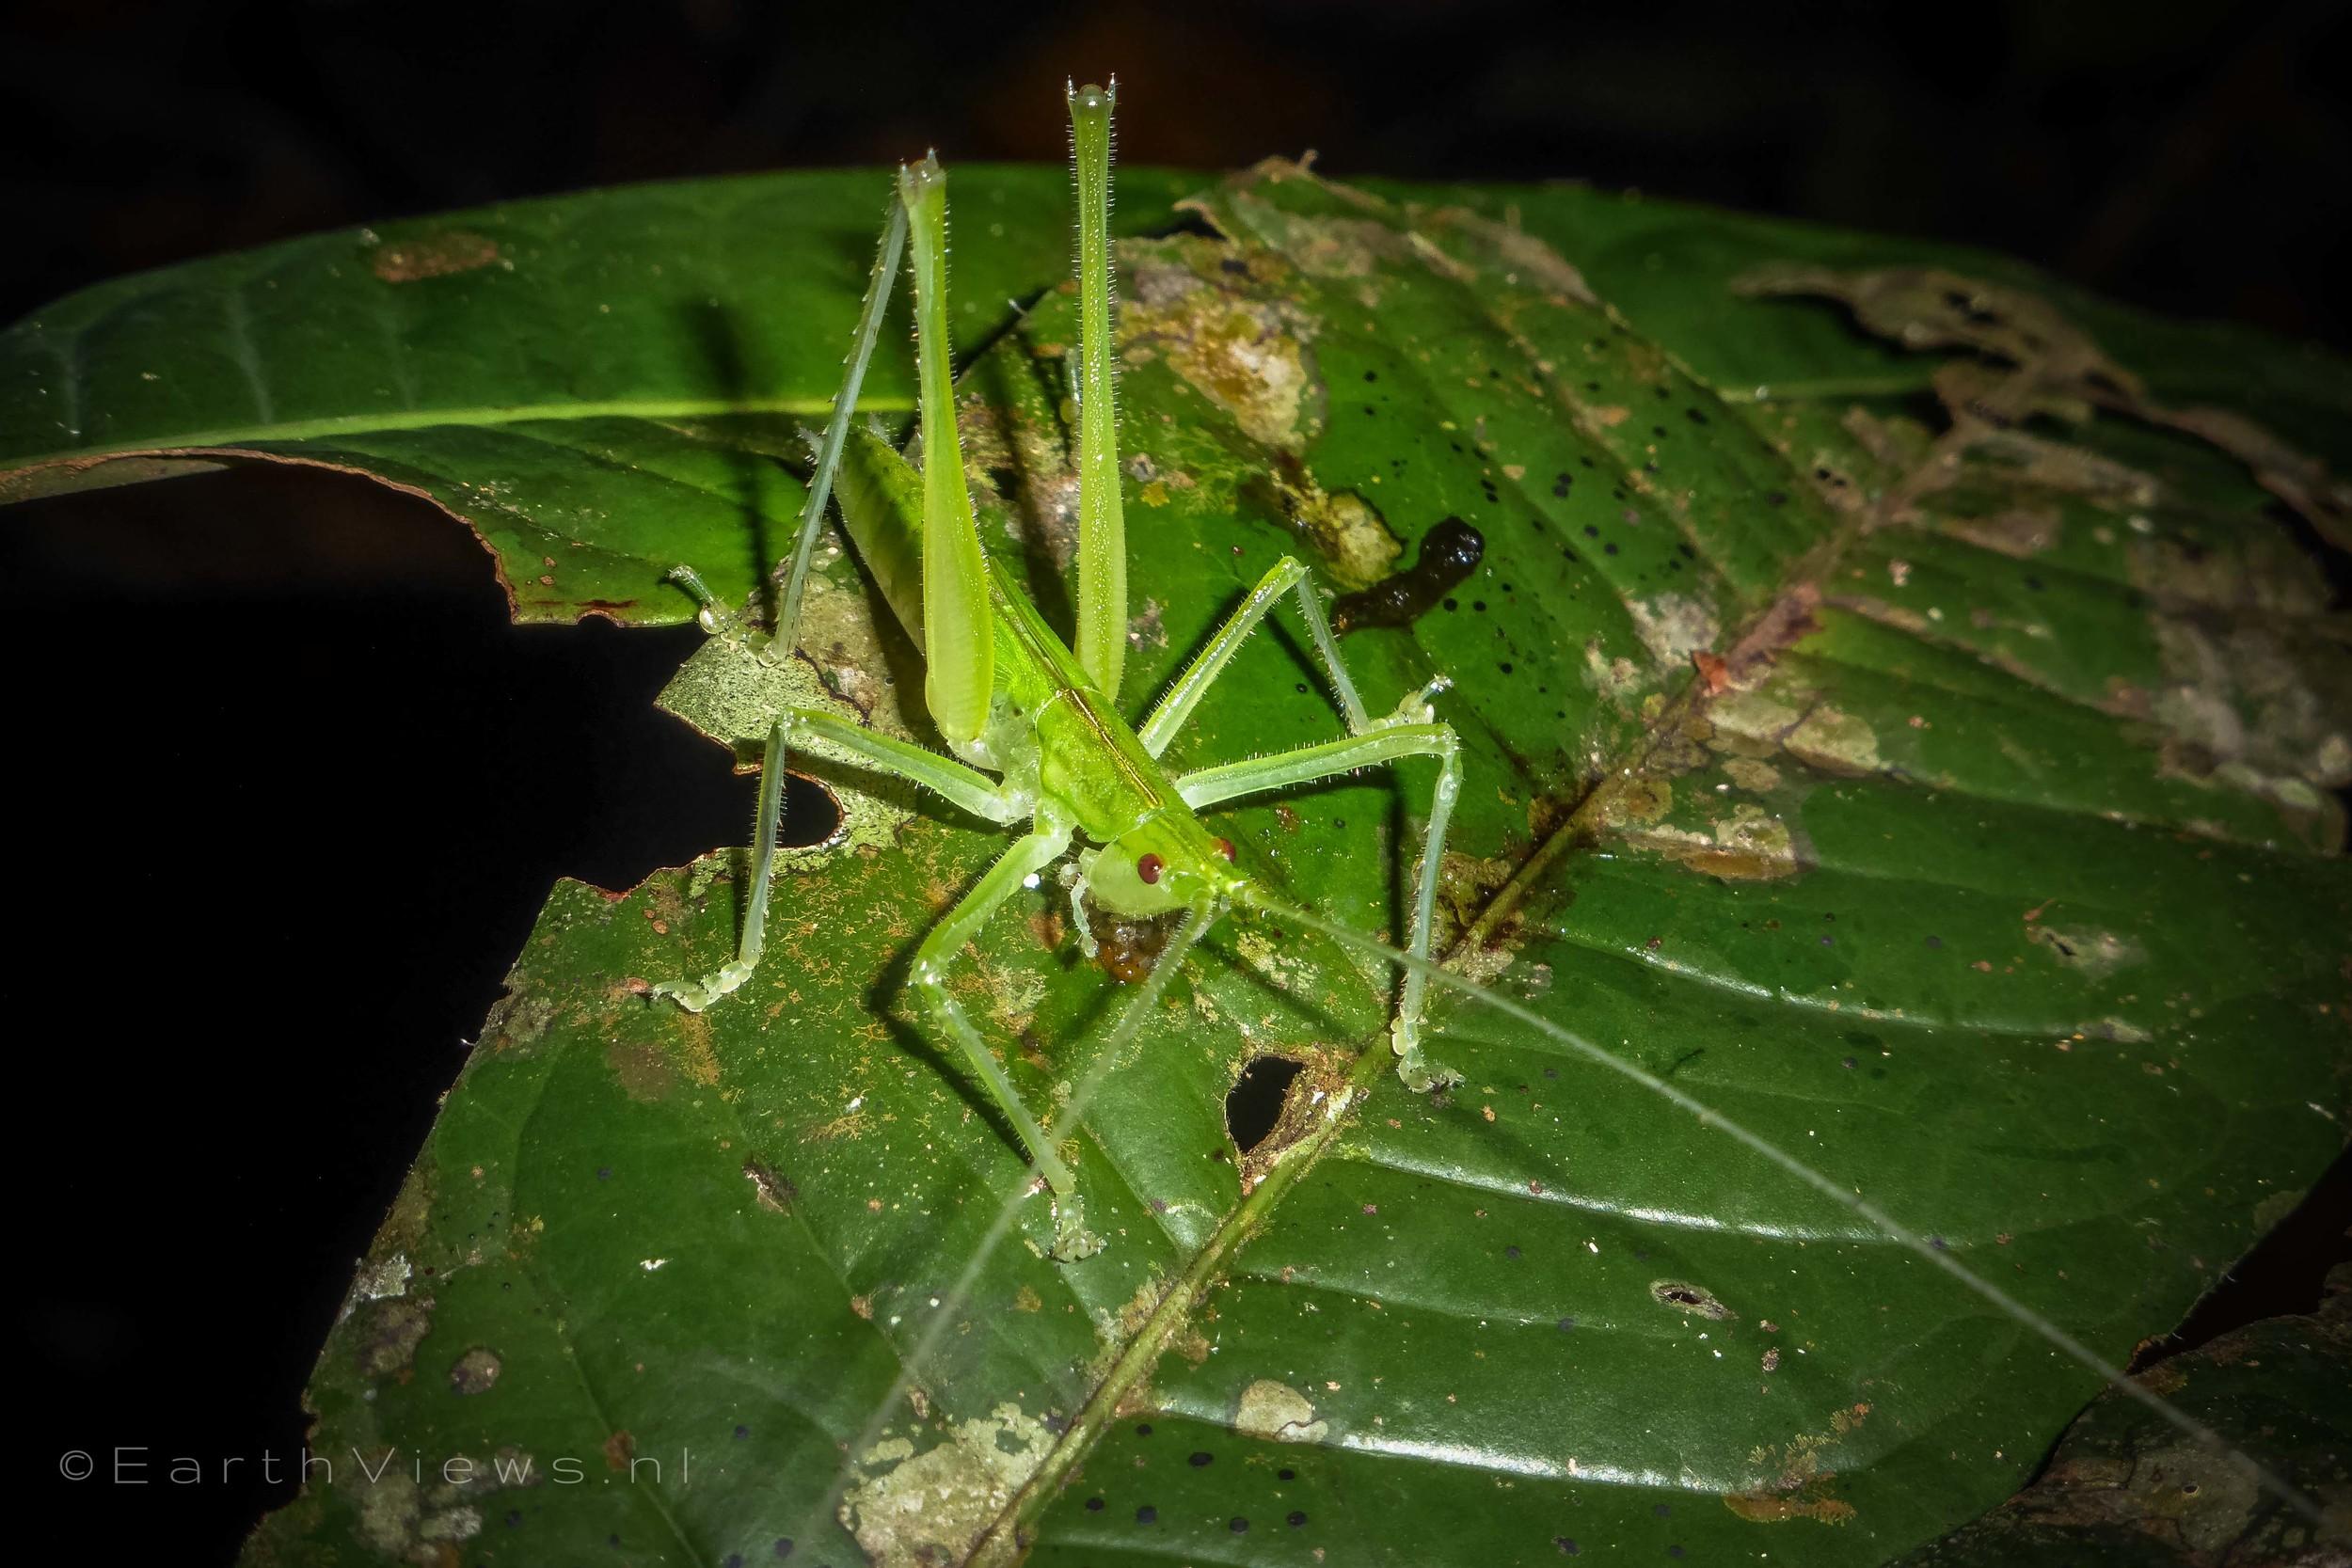 some kind of grasshopper.